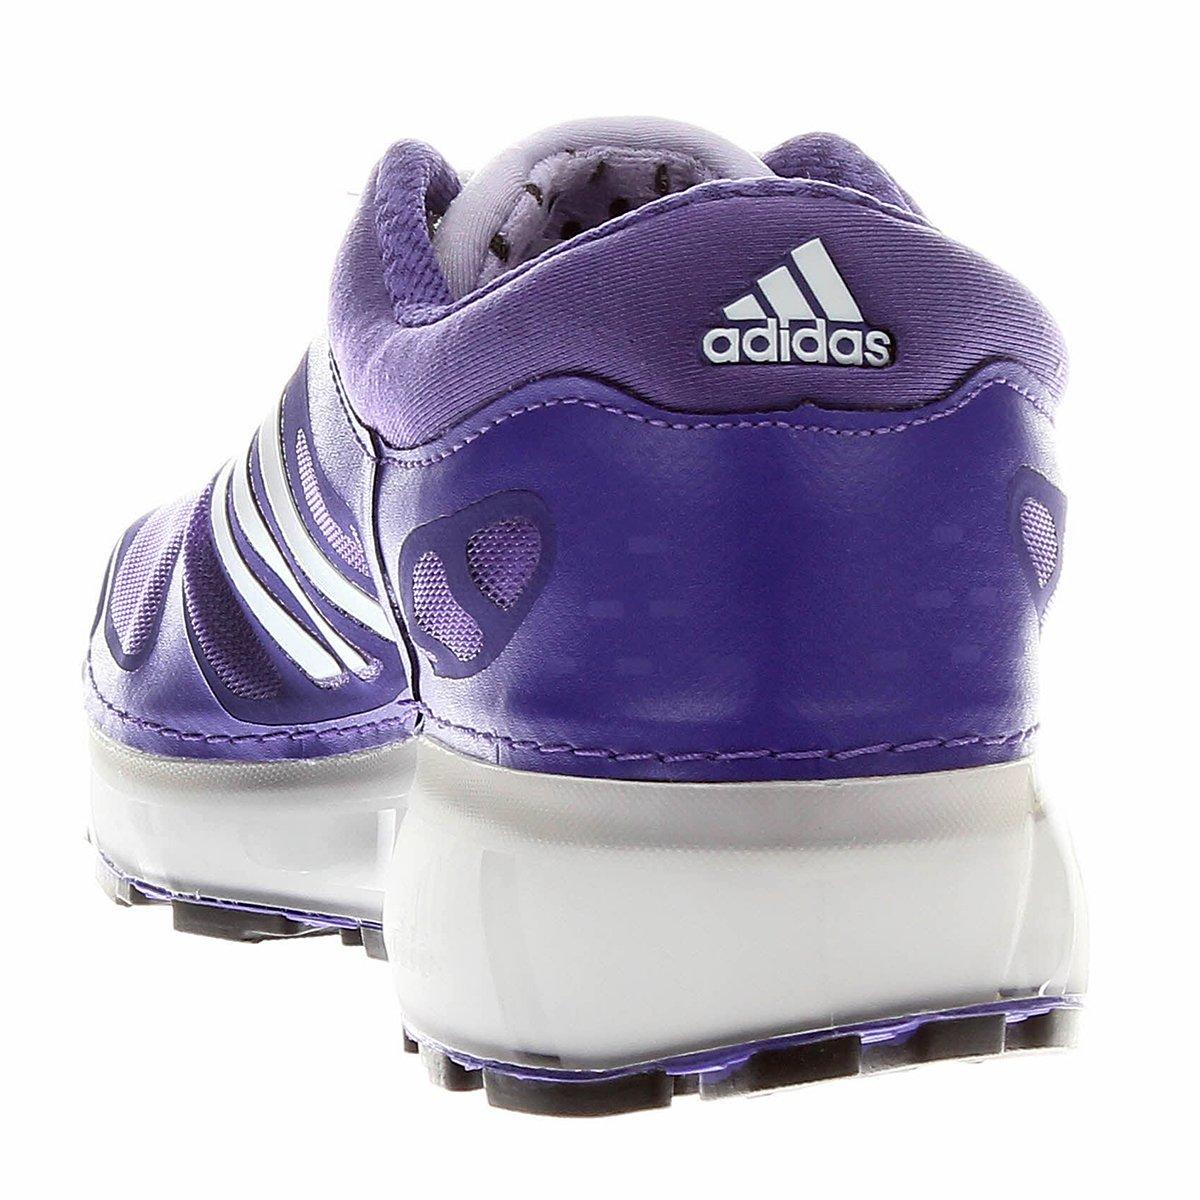 Tênis Adidas Cosmic Ice Feminino - Compre Agora  b656bd9846a71